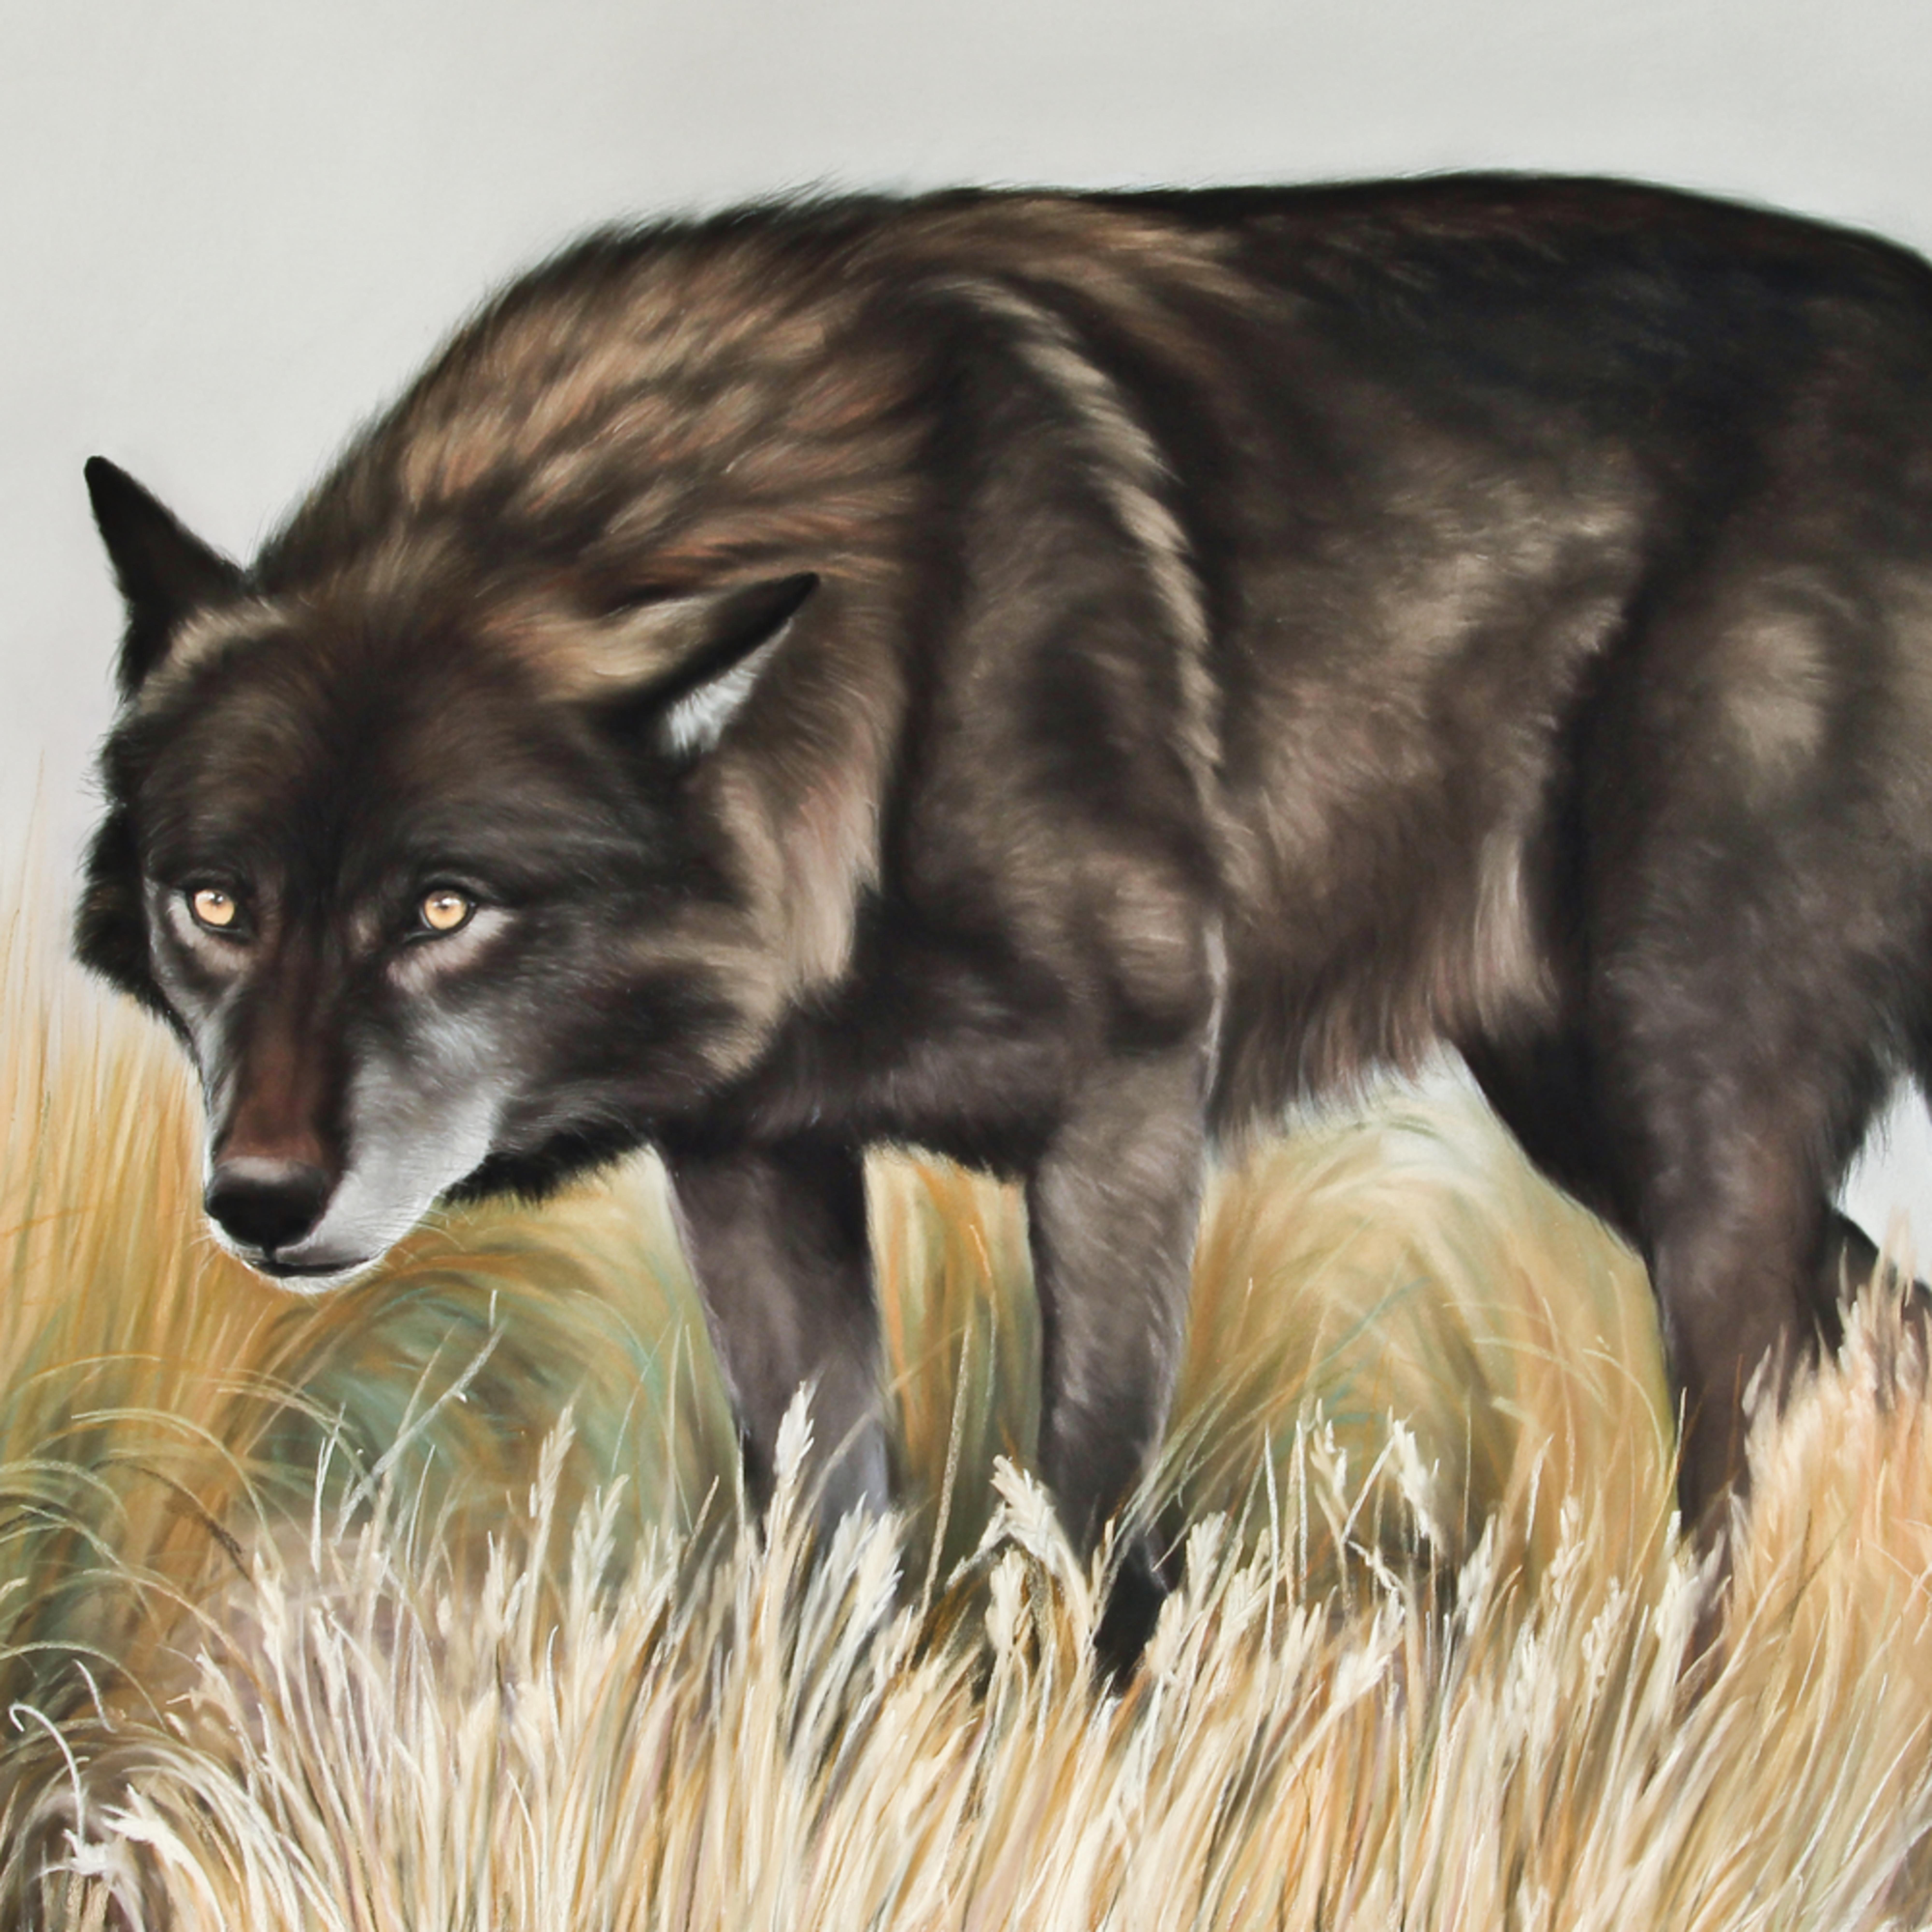 Blackwolf 1 of 1 qdv2hb